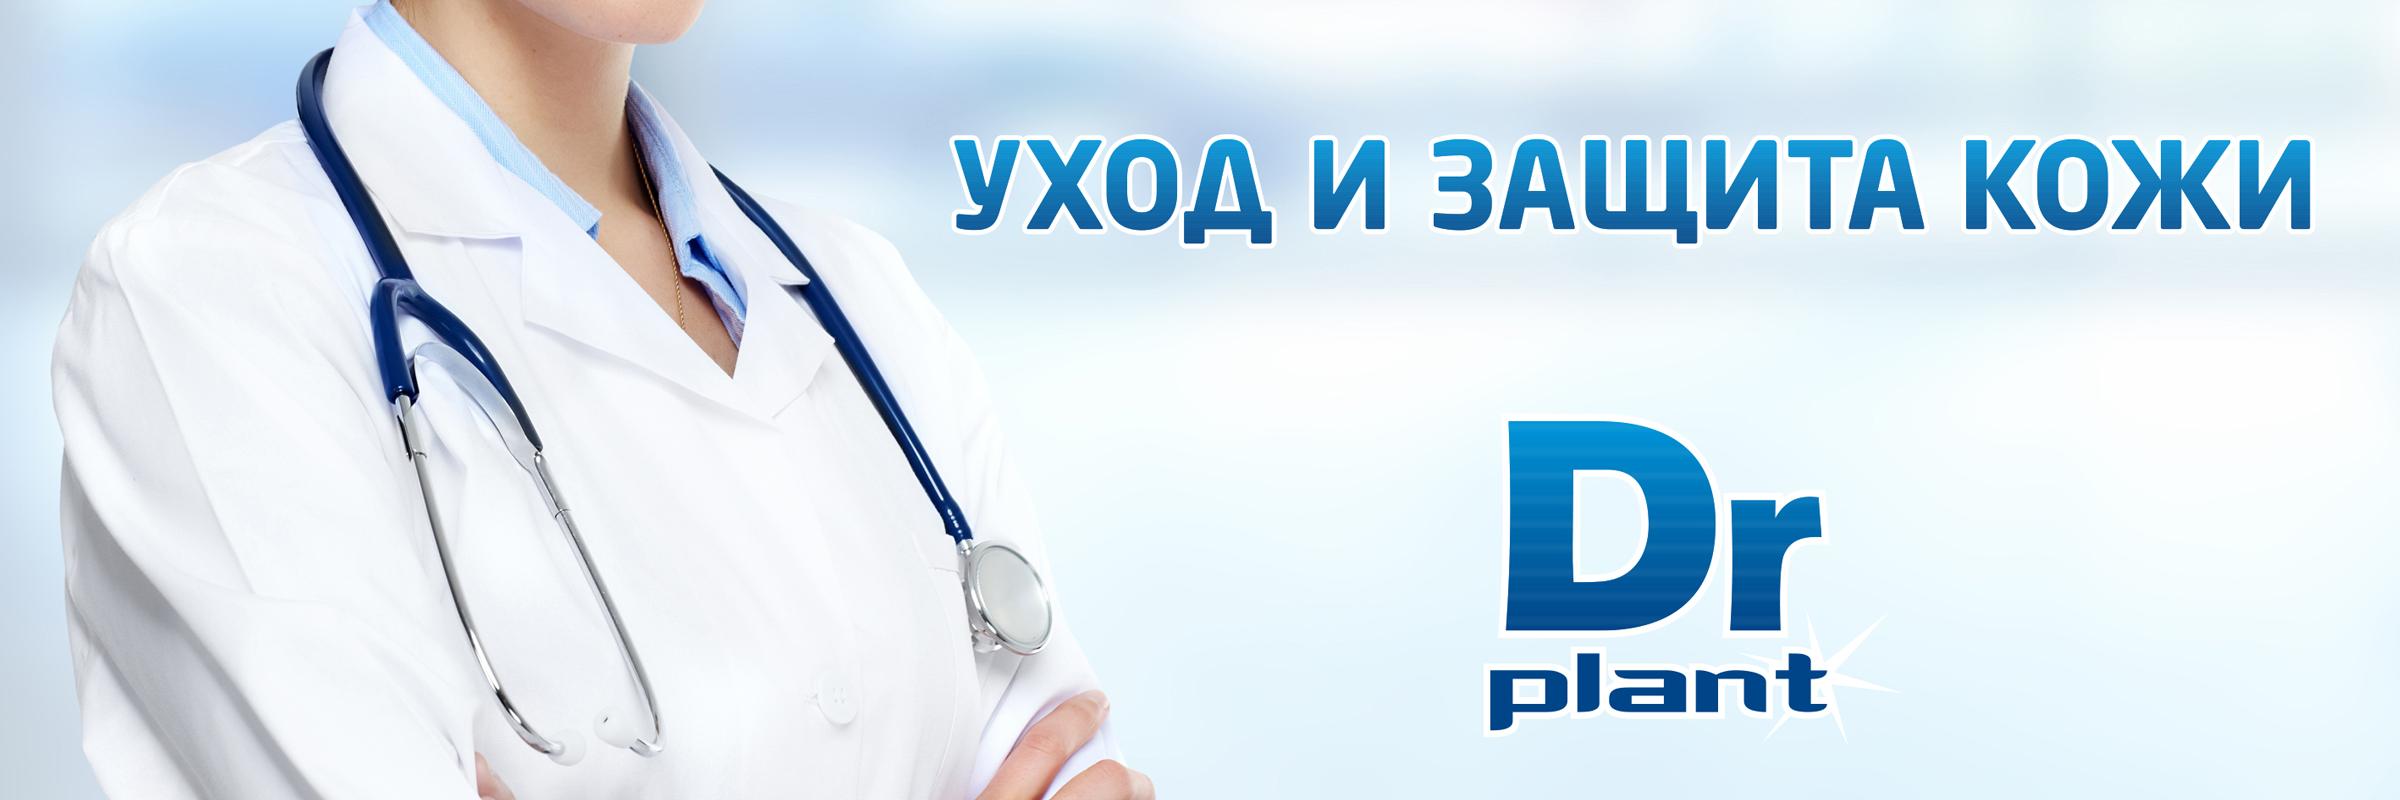 Д-р Плант